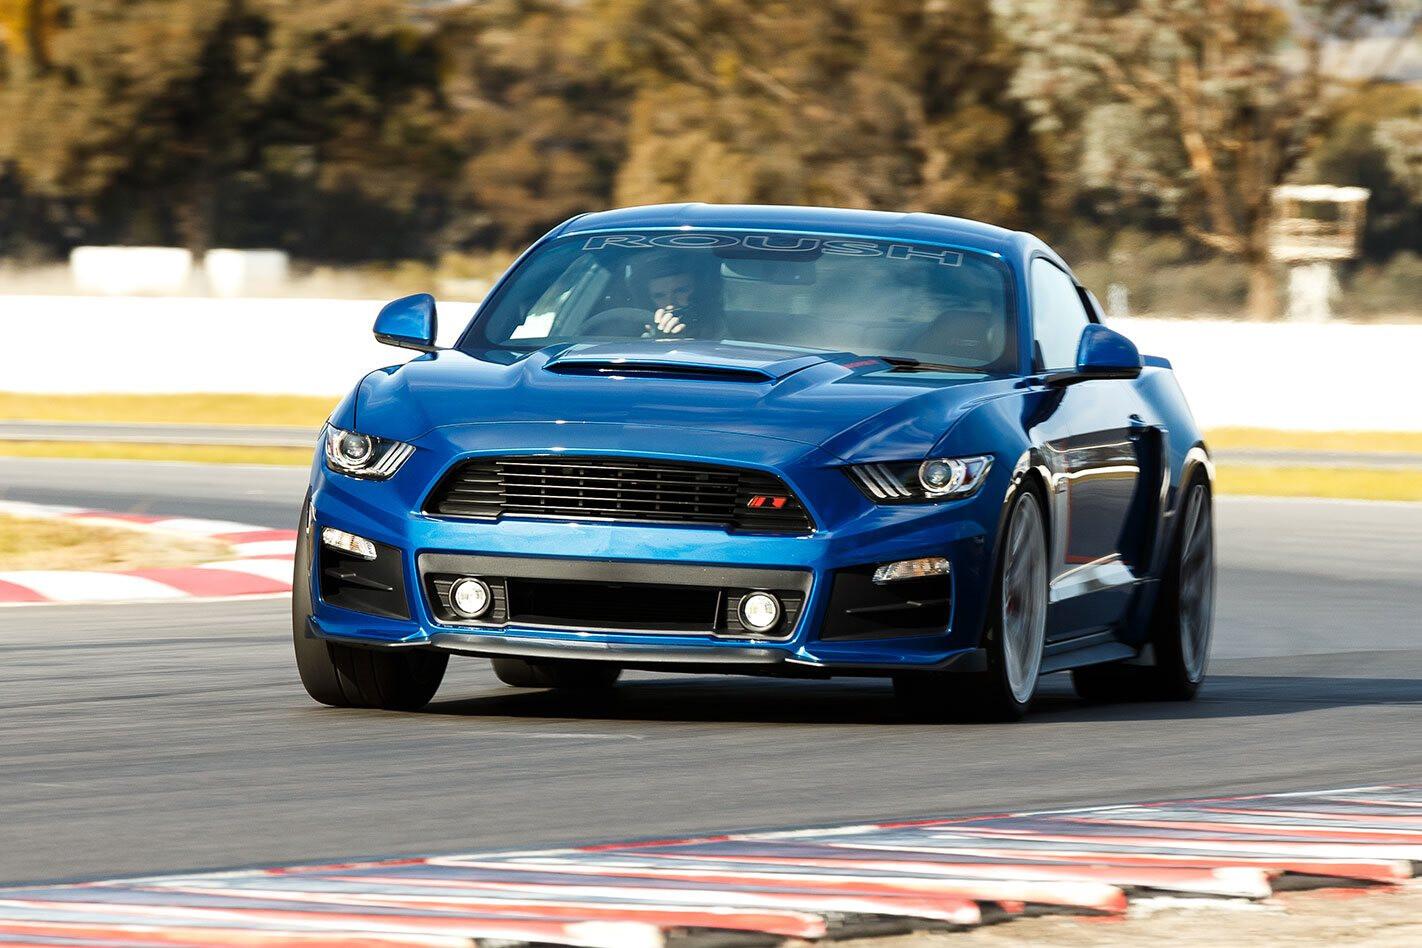 Ford Mustang Hot Tuner 2017 Winner Mustang Motorsport MM R727 feature